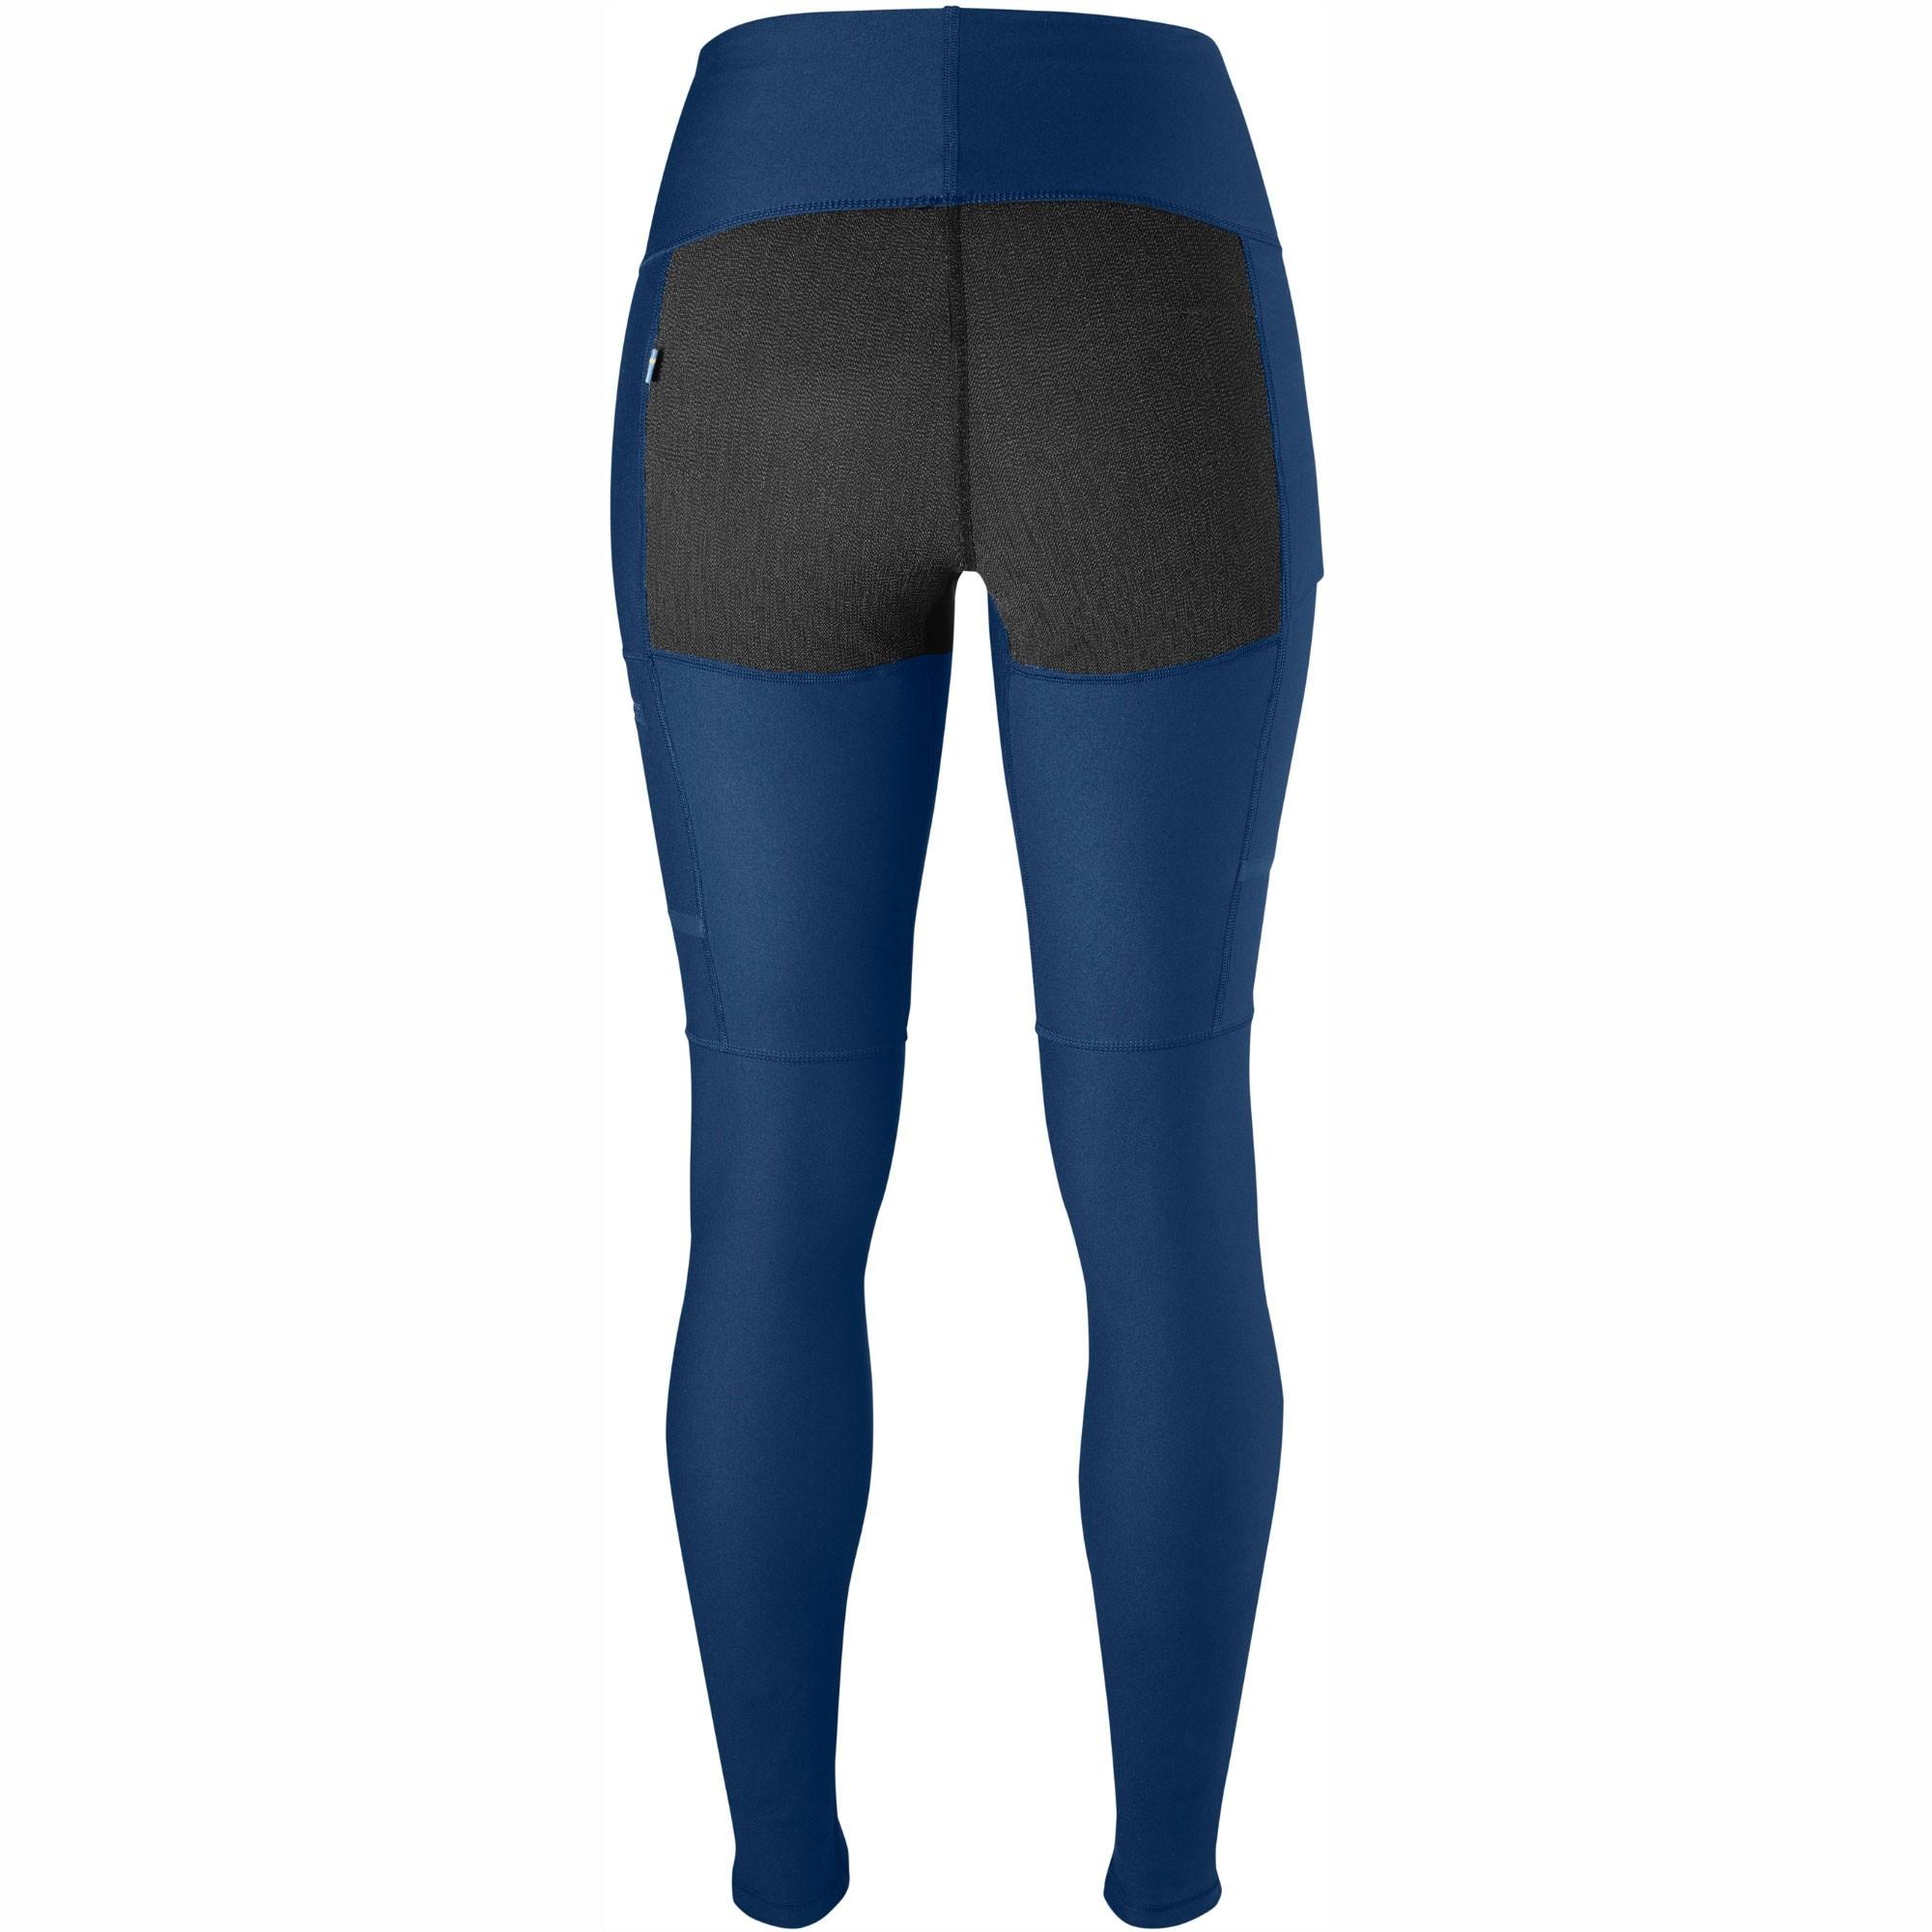 Fjallraven Abisko Women's Trekking Tights - Deep Blue Back